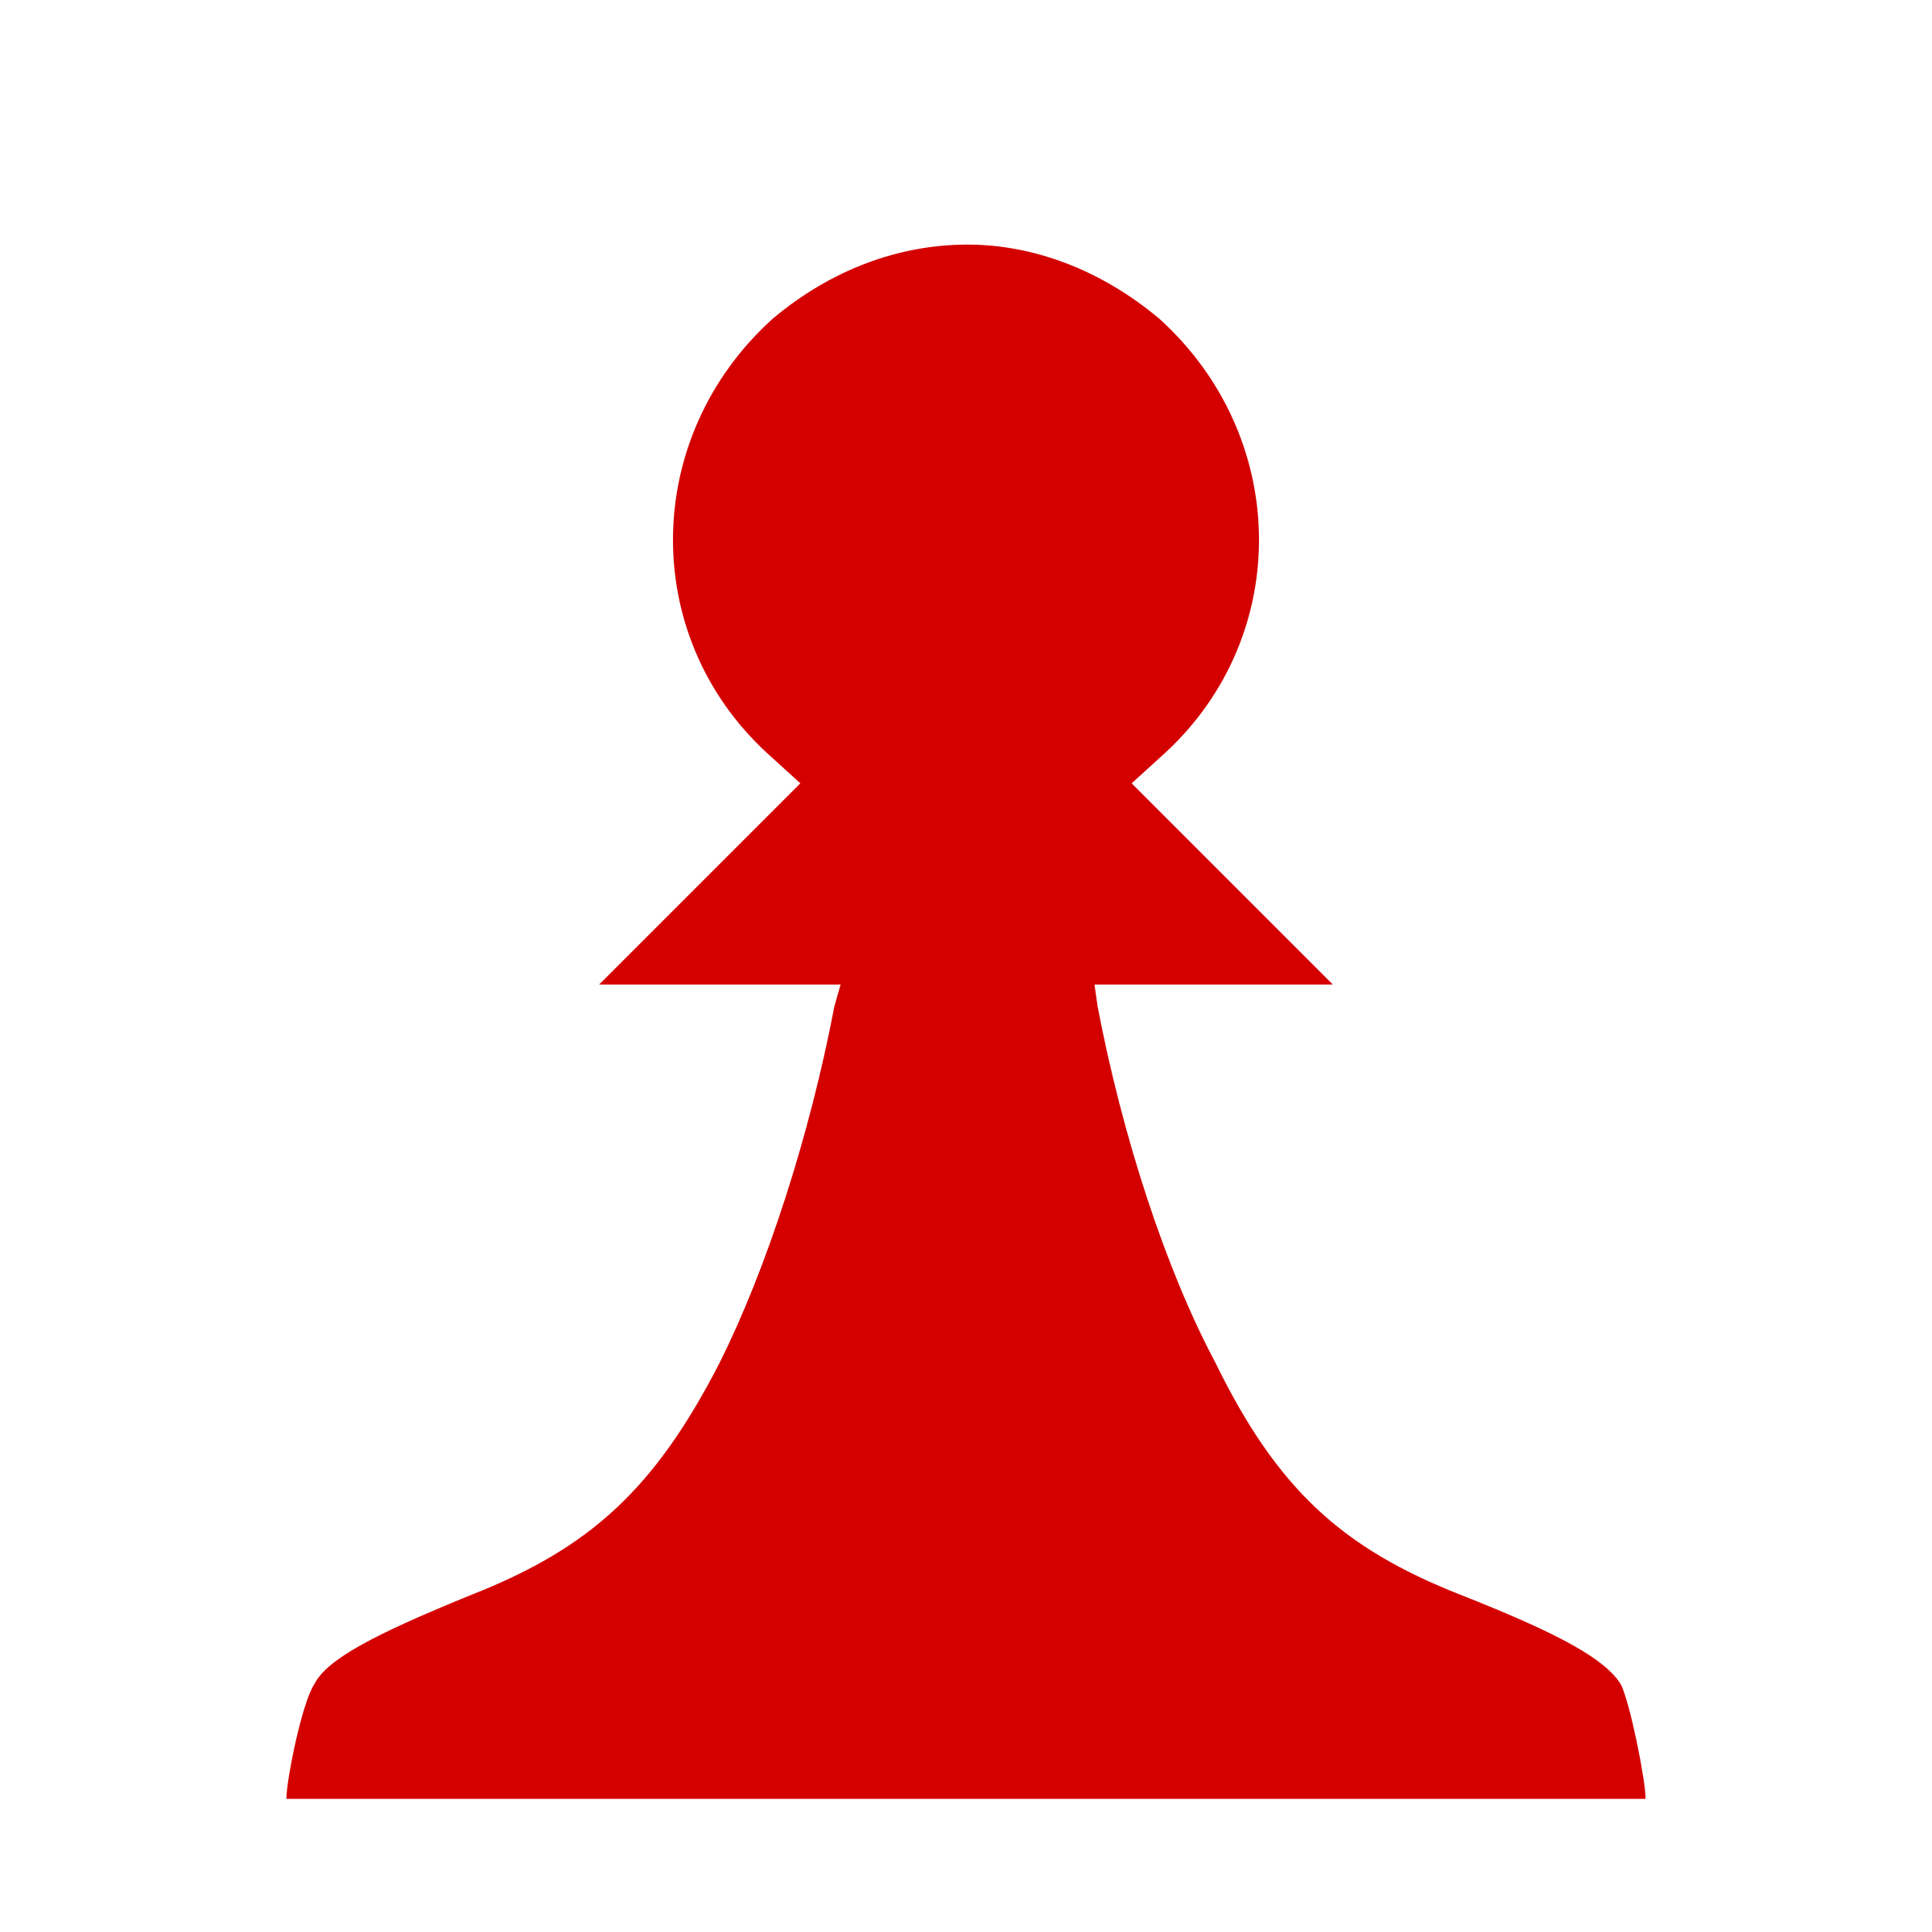 2400x2400 Chess Piece Silhouette